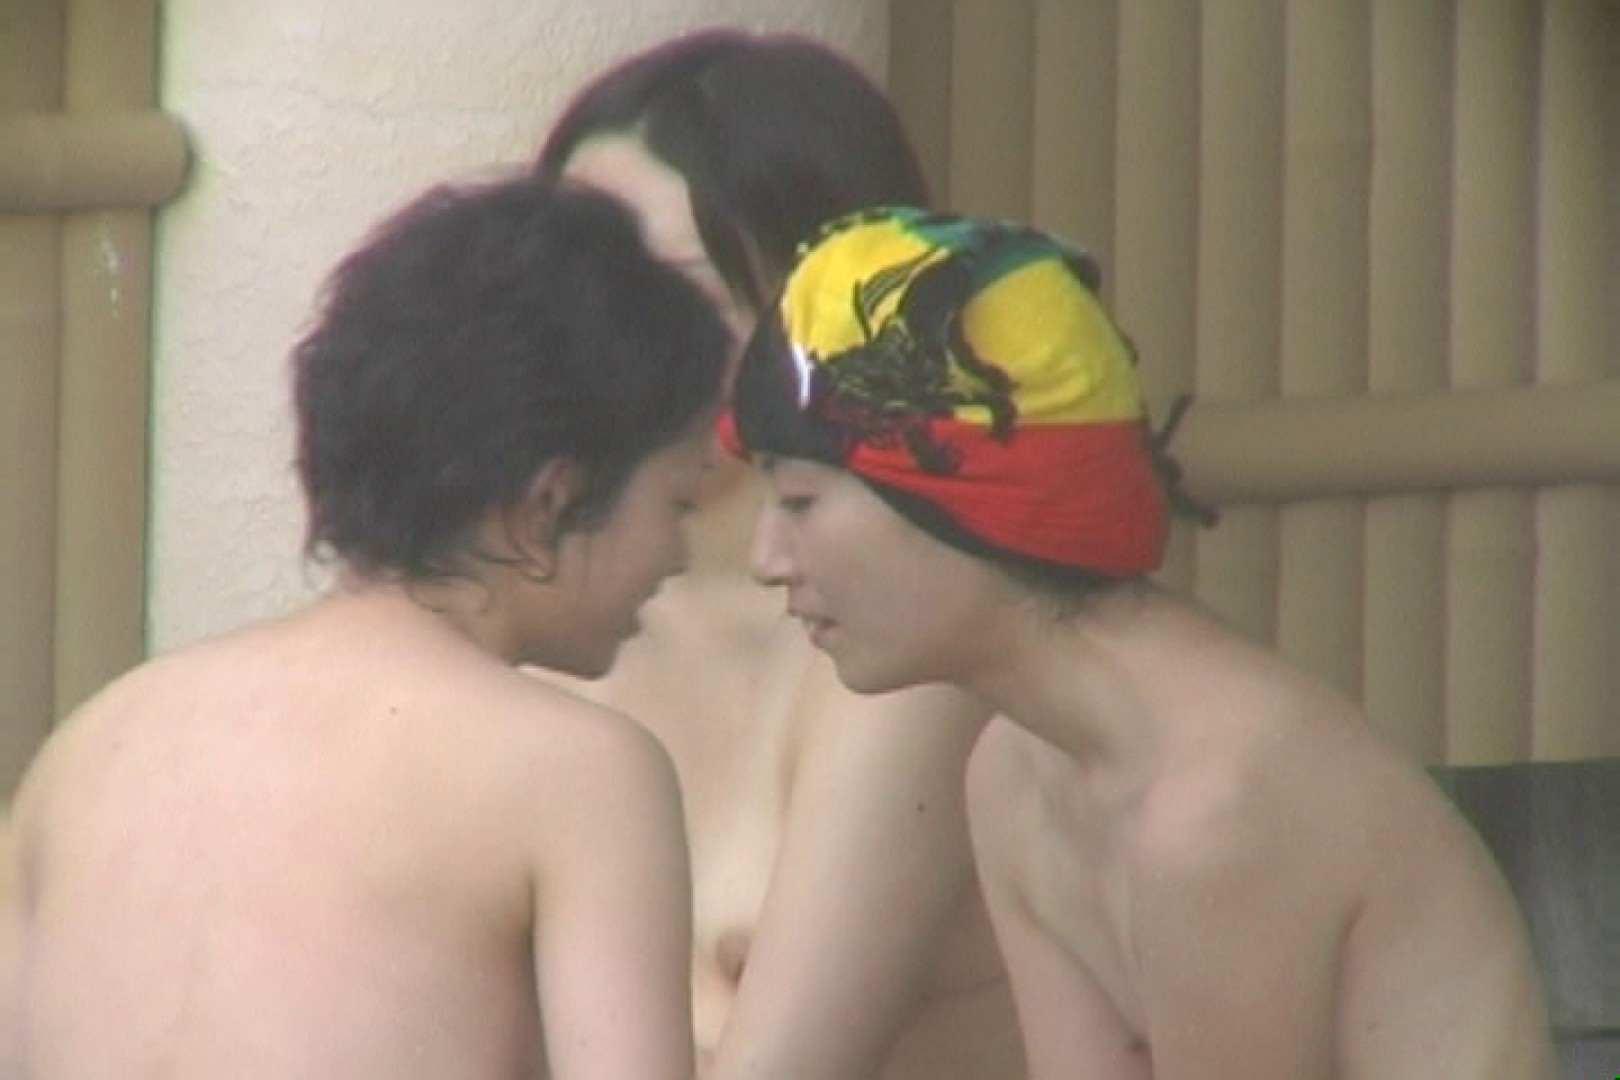 Aquaな露天風呂Vol.61【VIP限定】 0  89連発 20